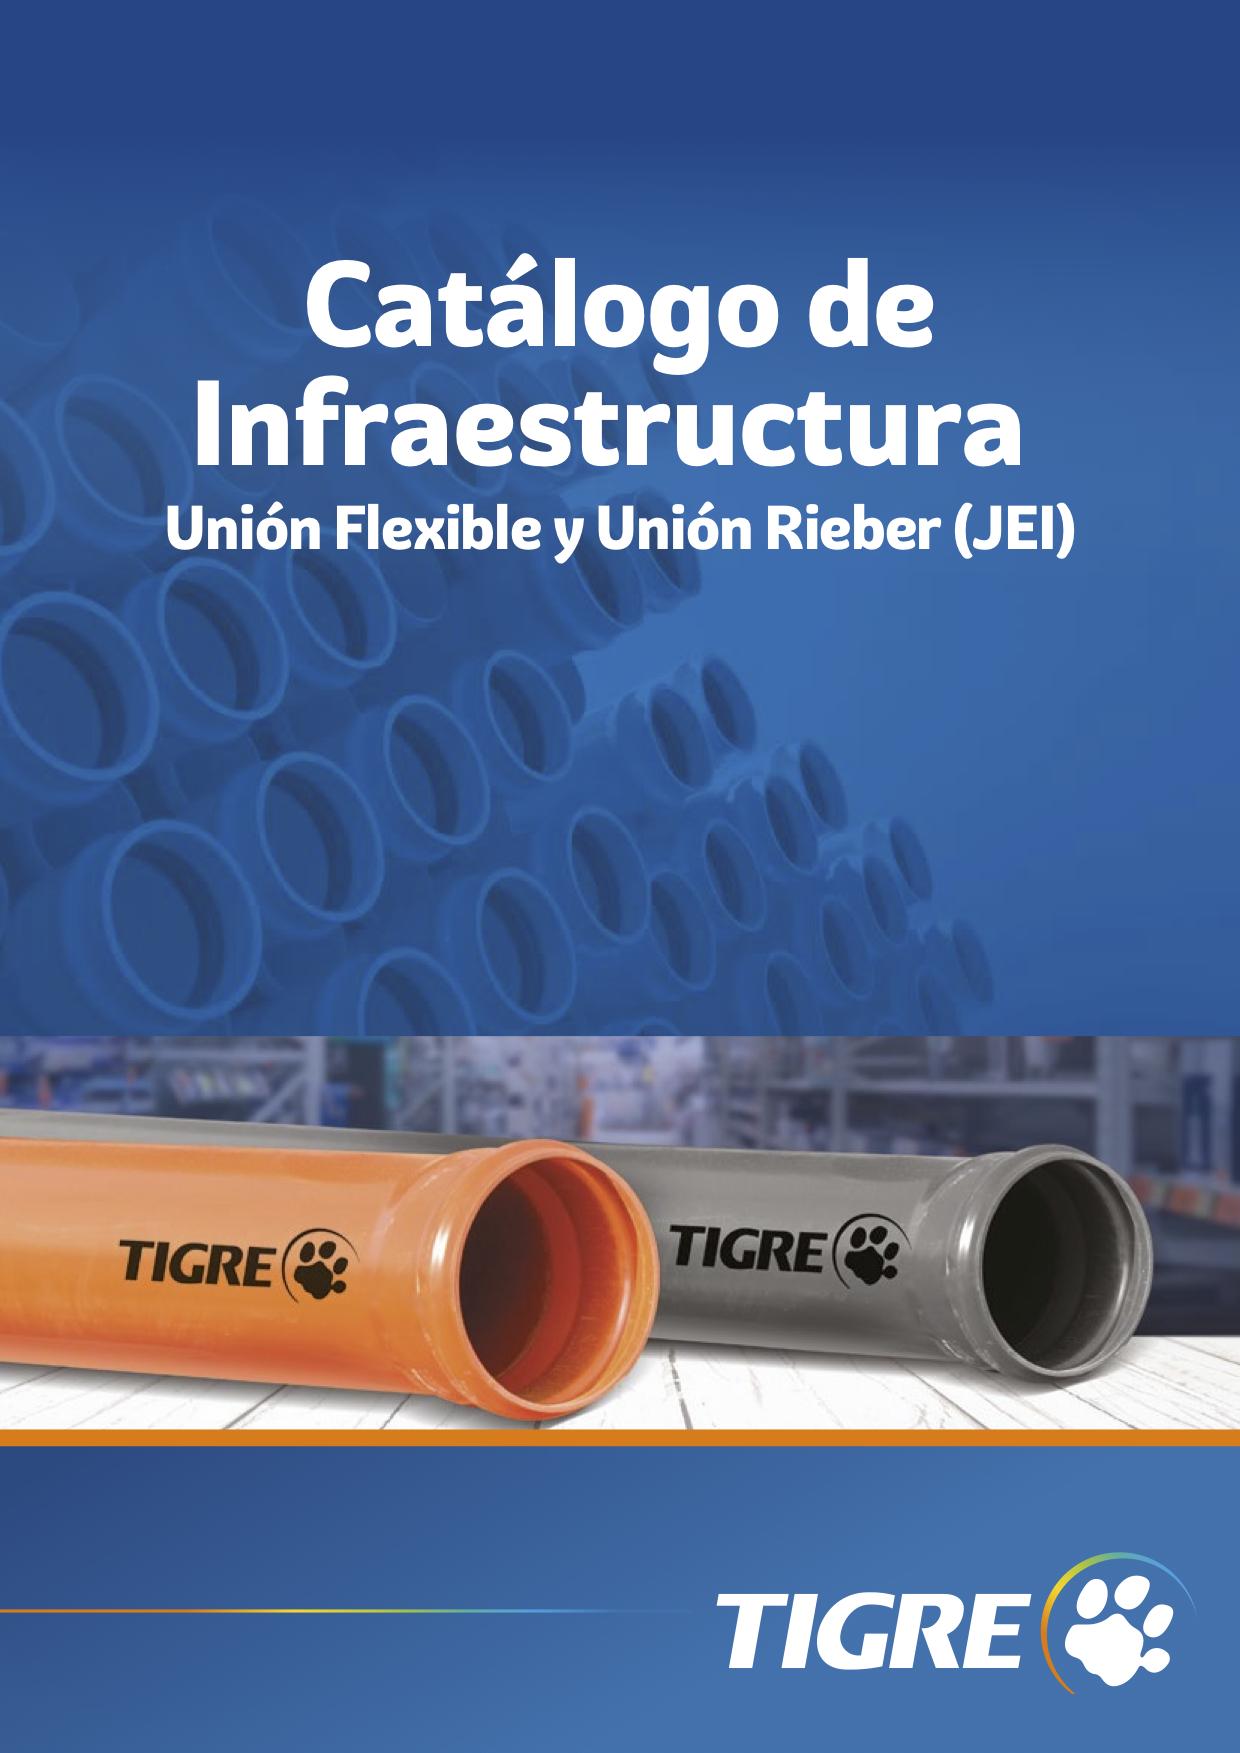 Catálogo Infraestructura